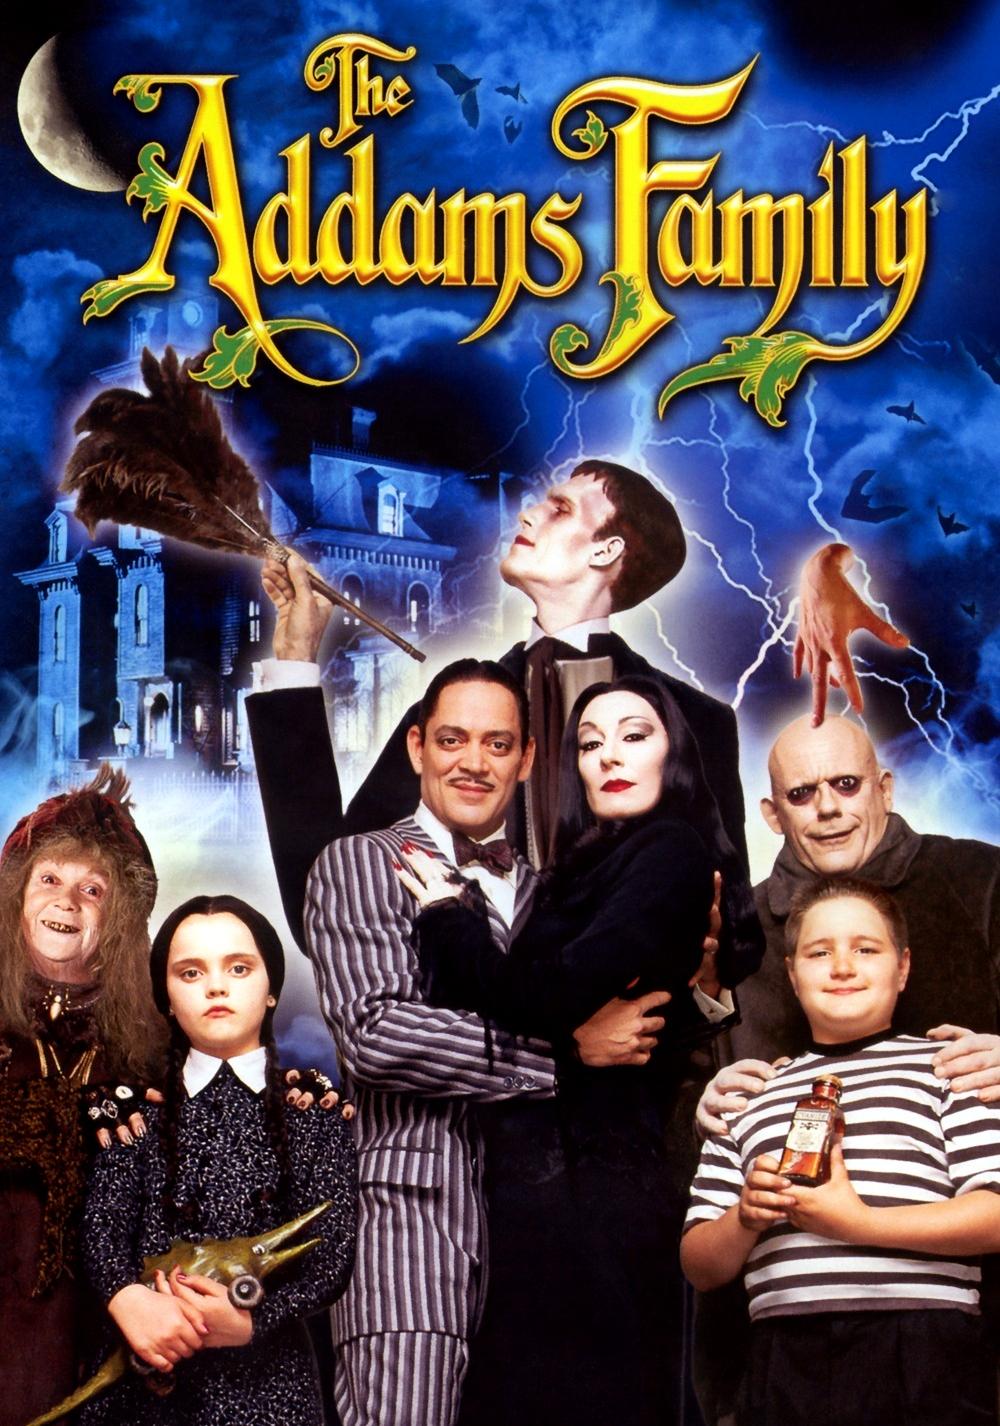 Addams Family Film